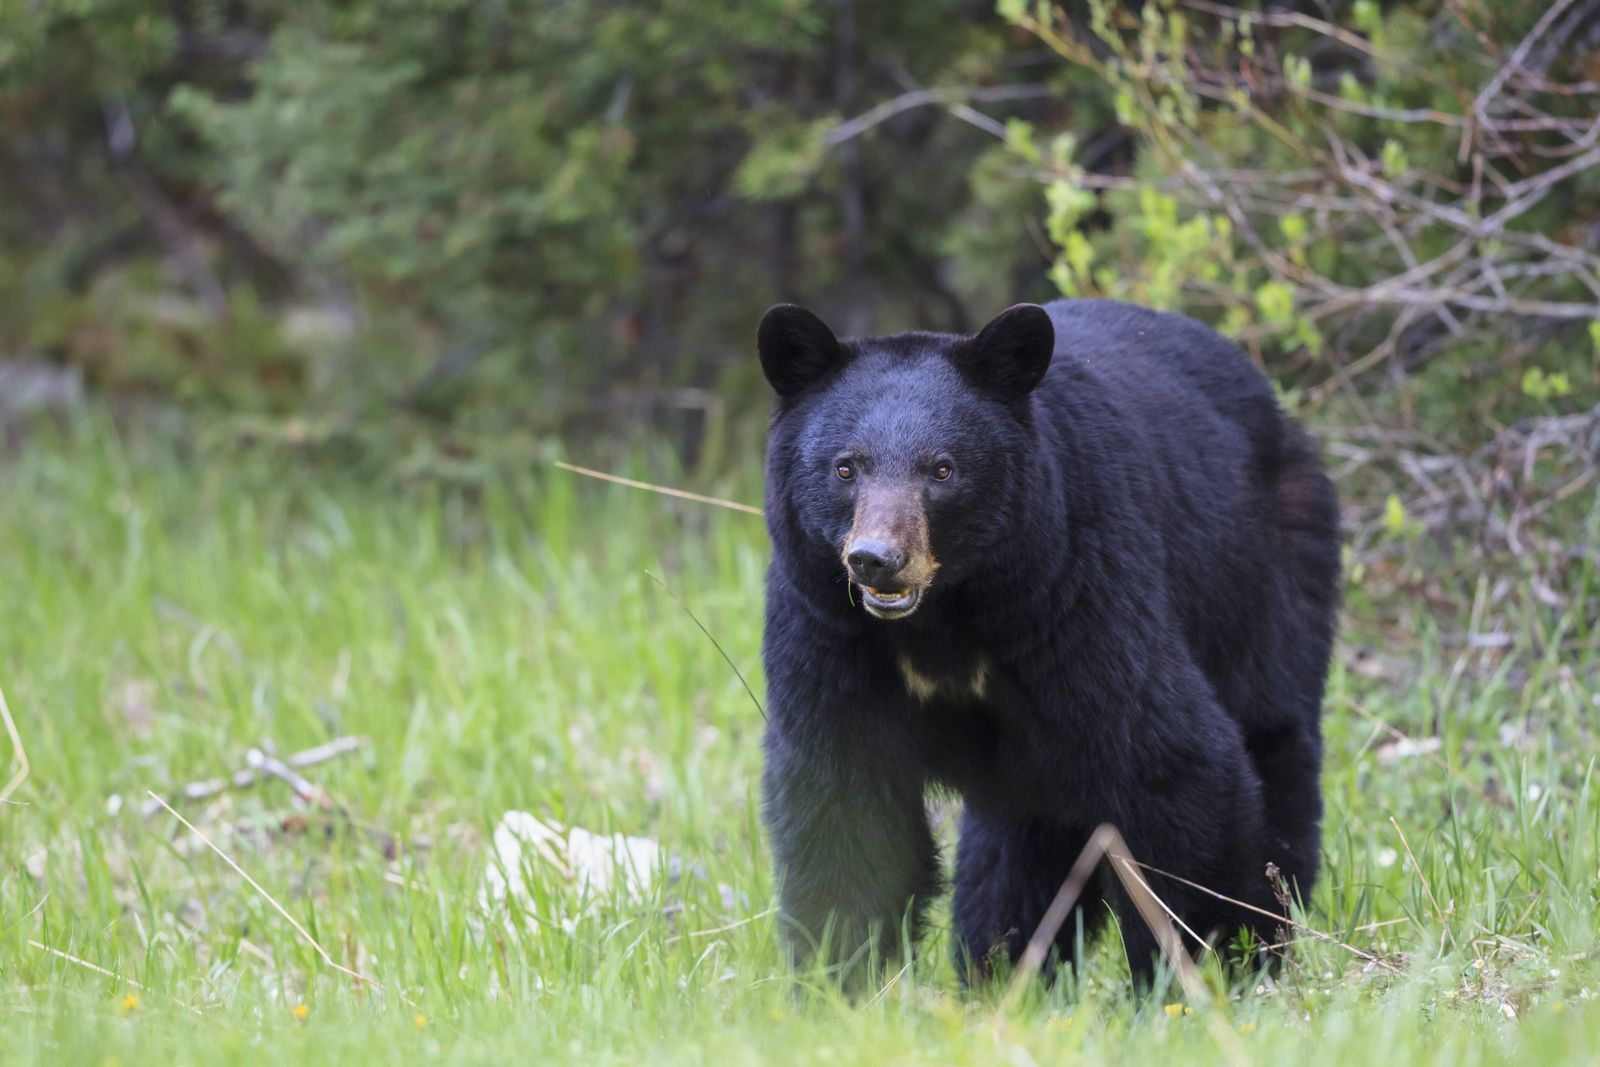 Canada Rocky Mountains Alberta Jasper National Park Banff National Park American black bear Ur